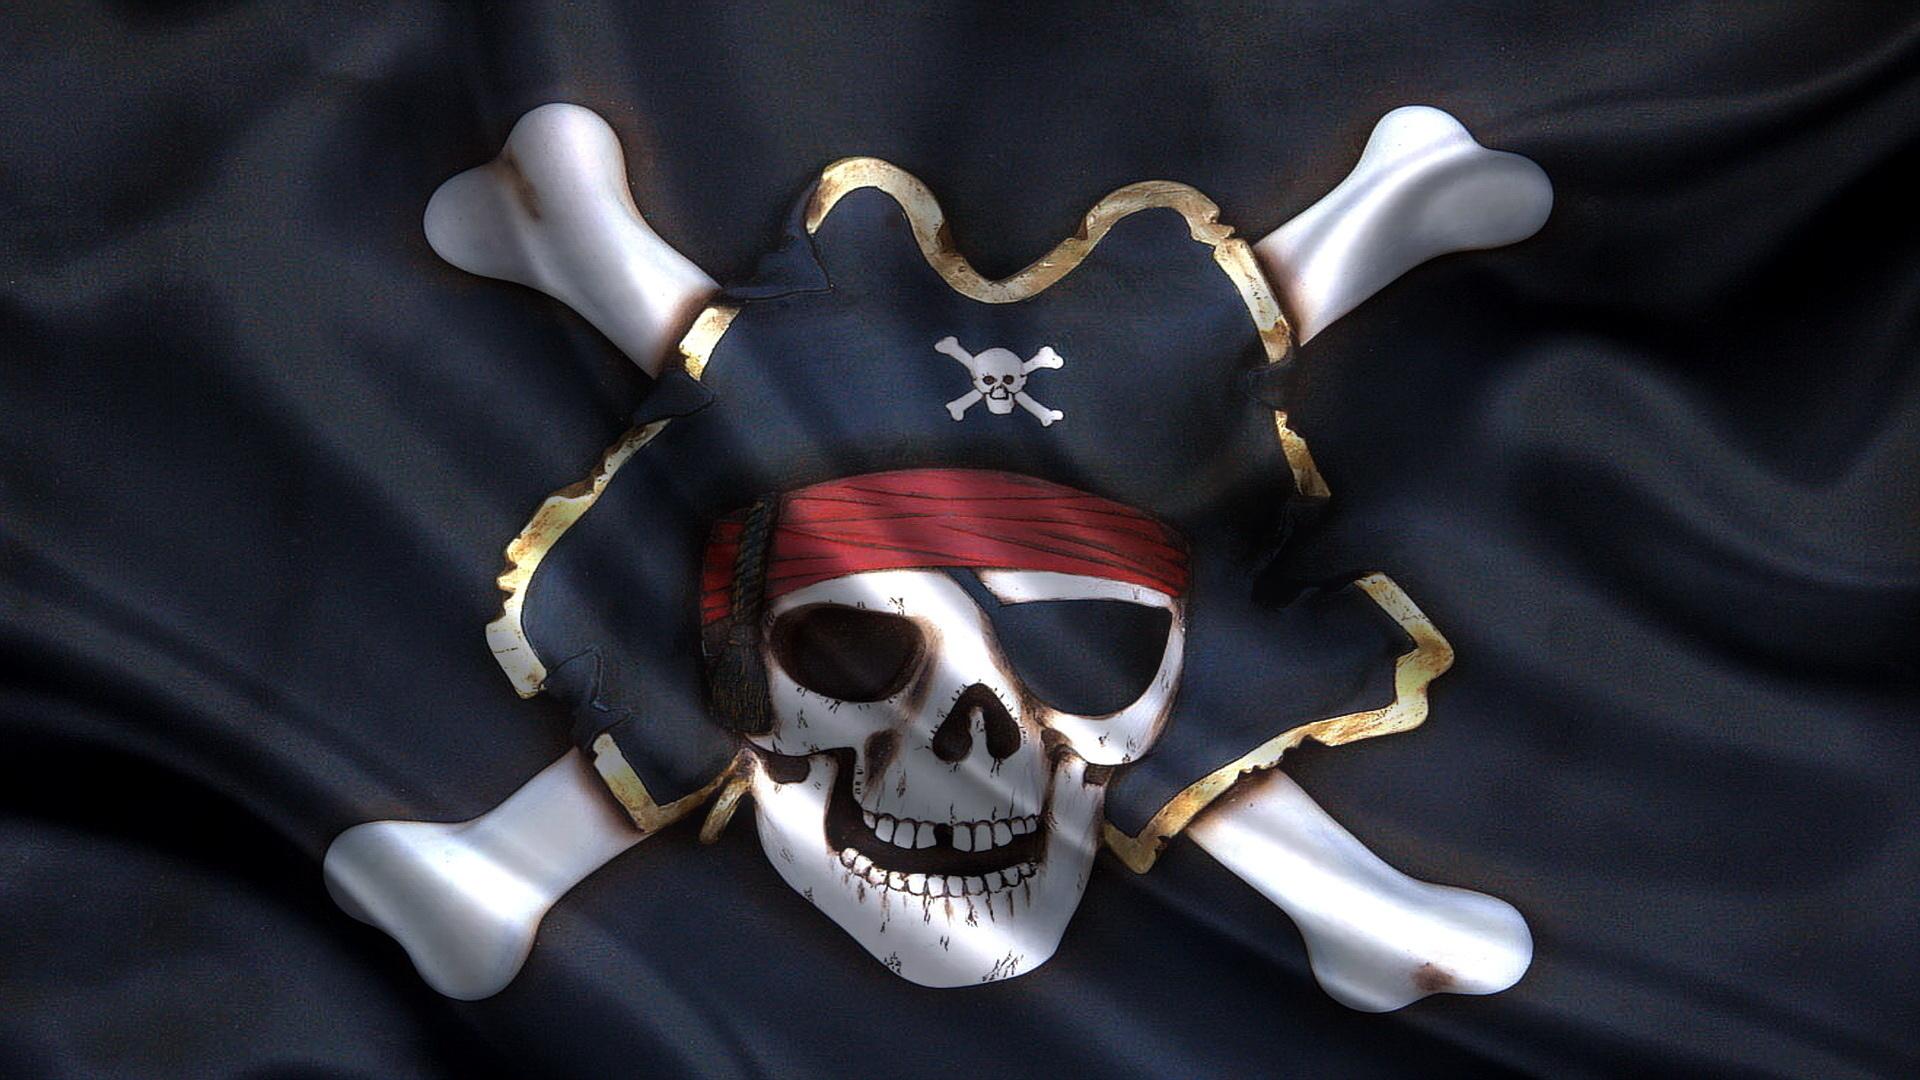 мужика фотообои пиратский флаг машину